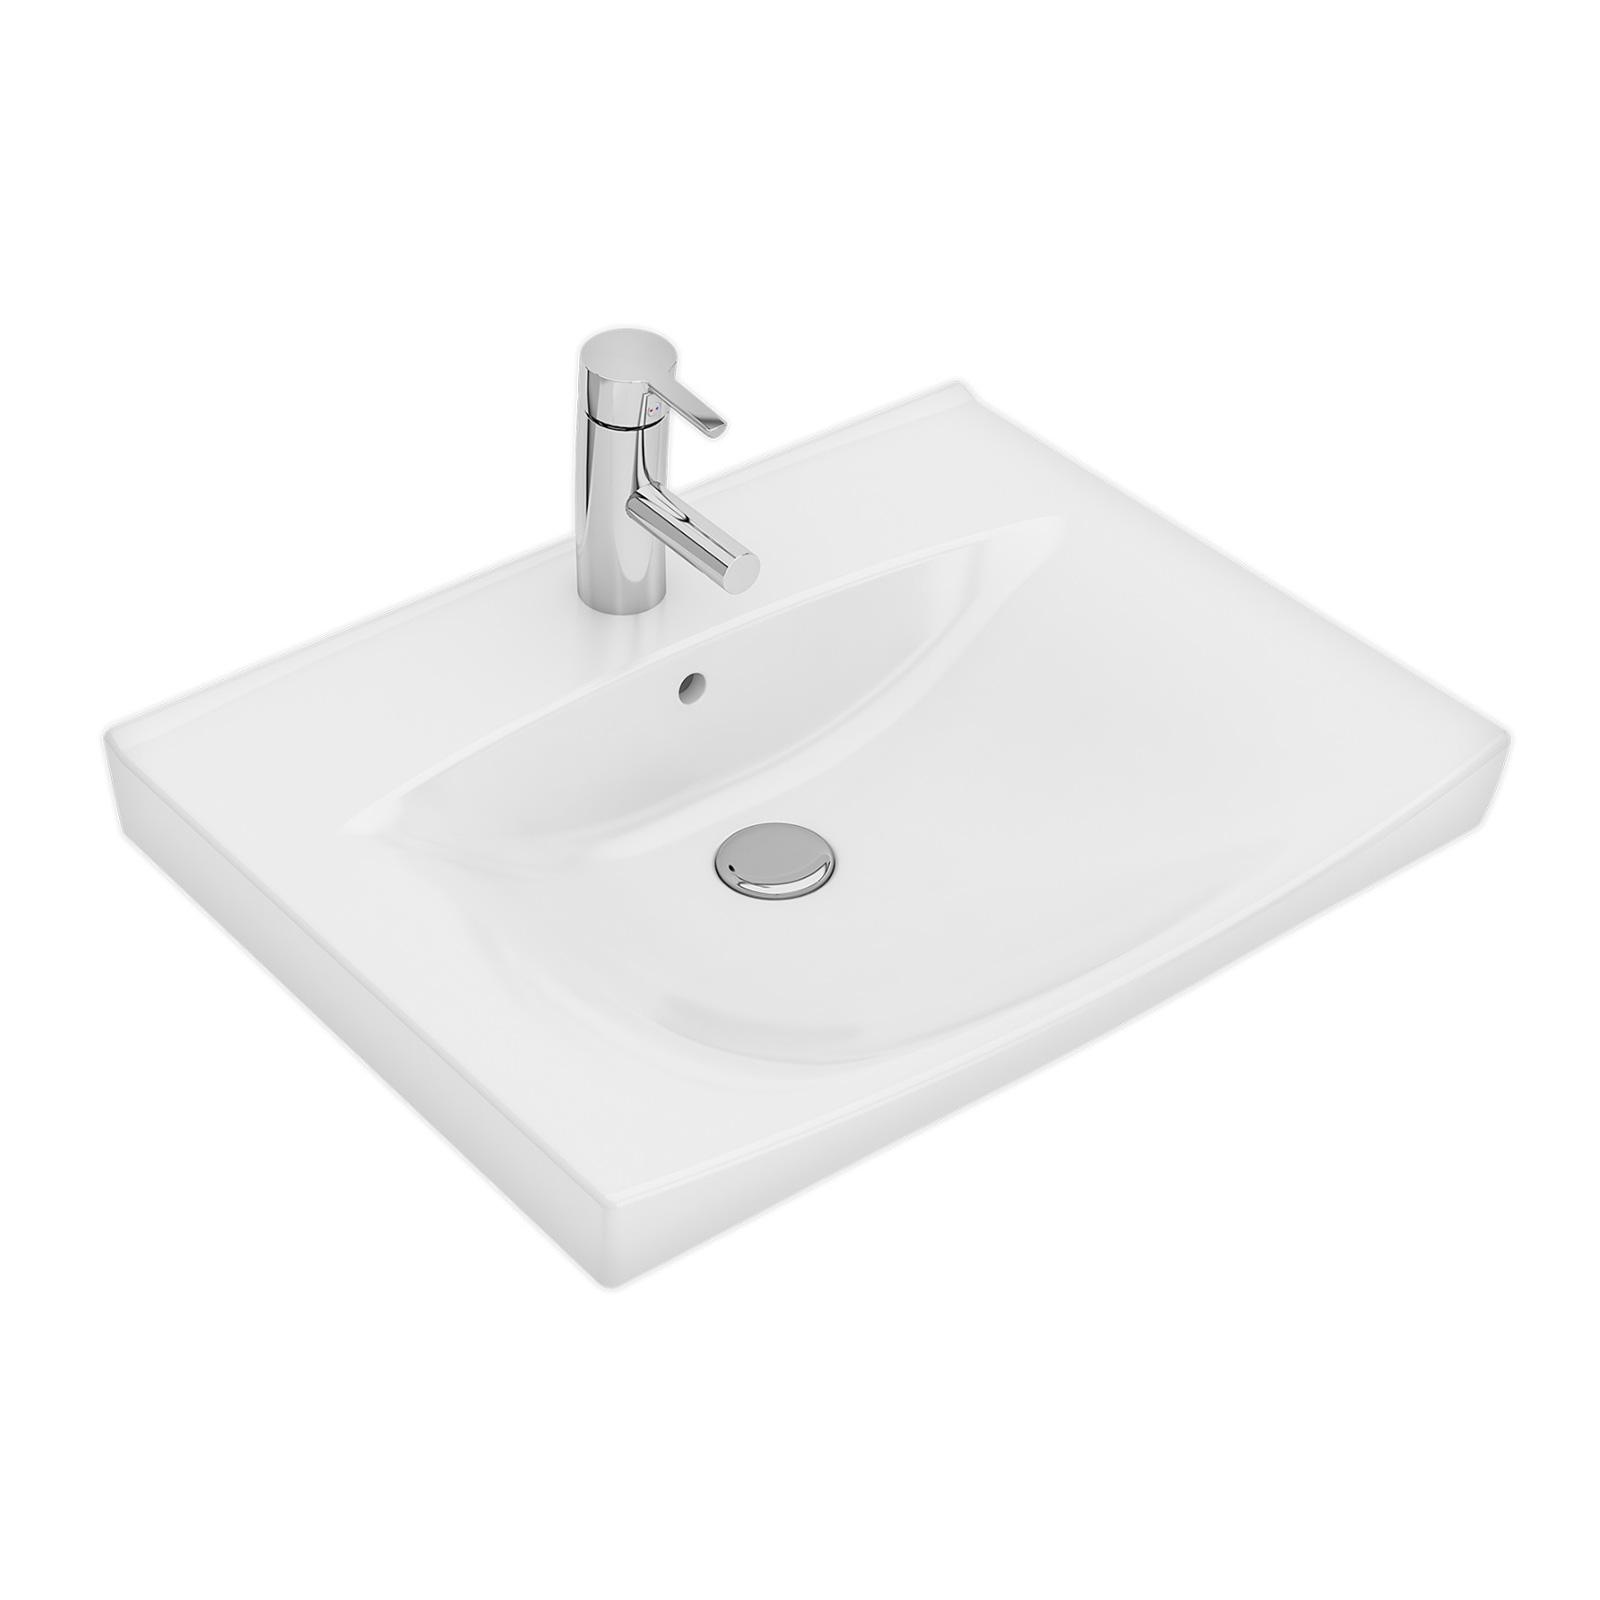 Tvättställ Ifö Spira 15242 60 cm